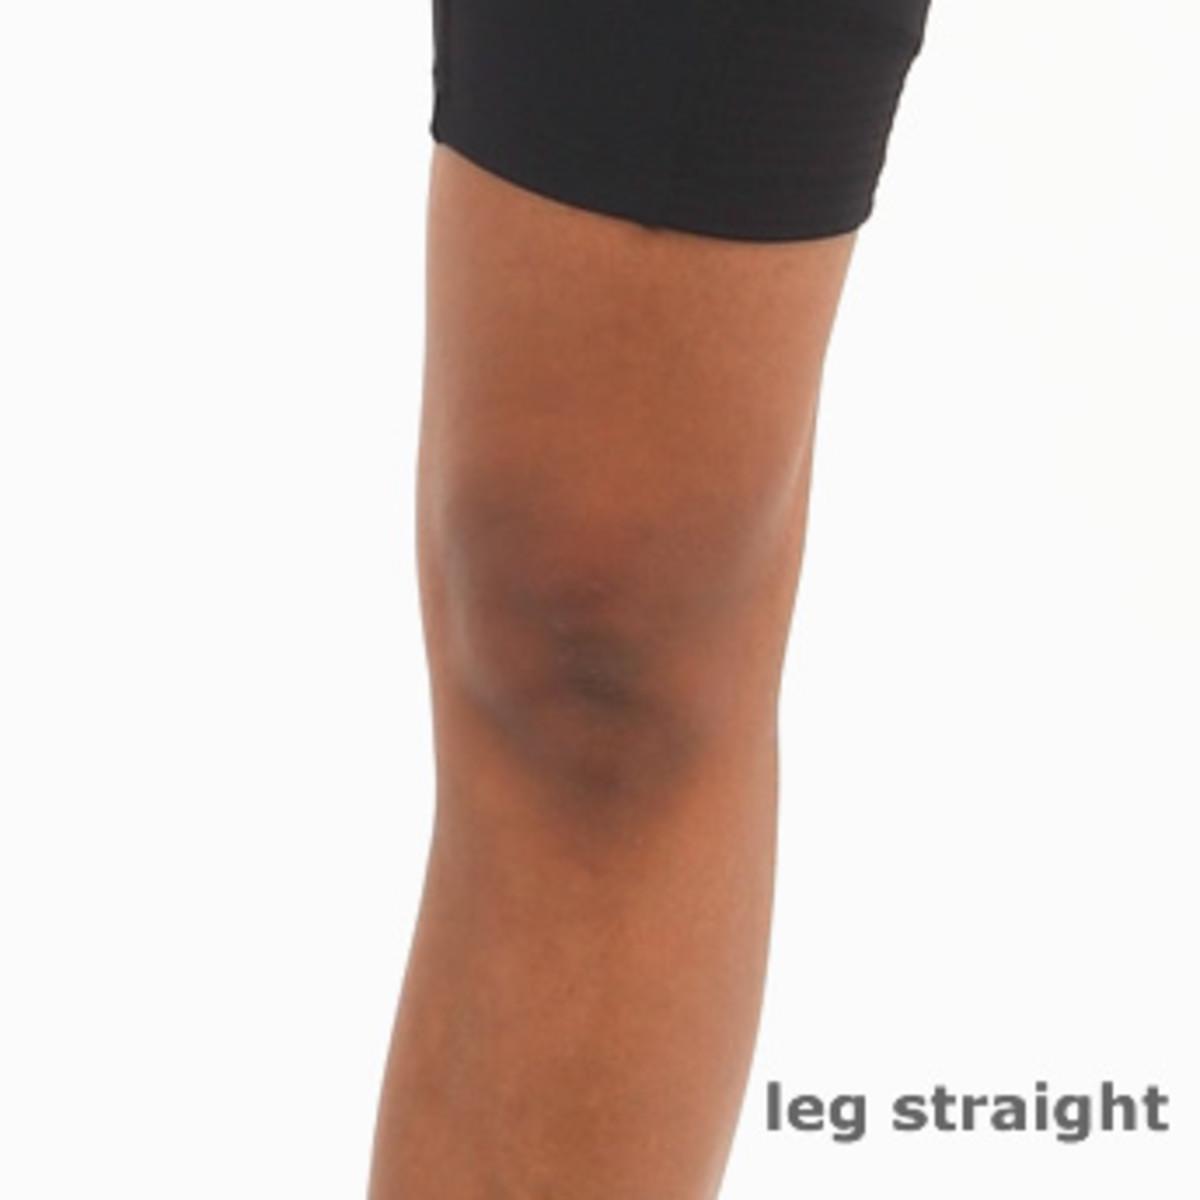 Locking the knee in Bikram Yoga